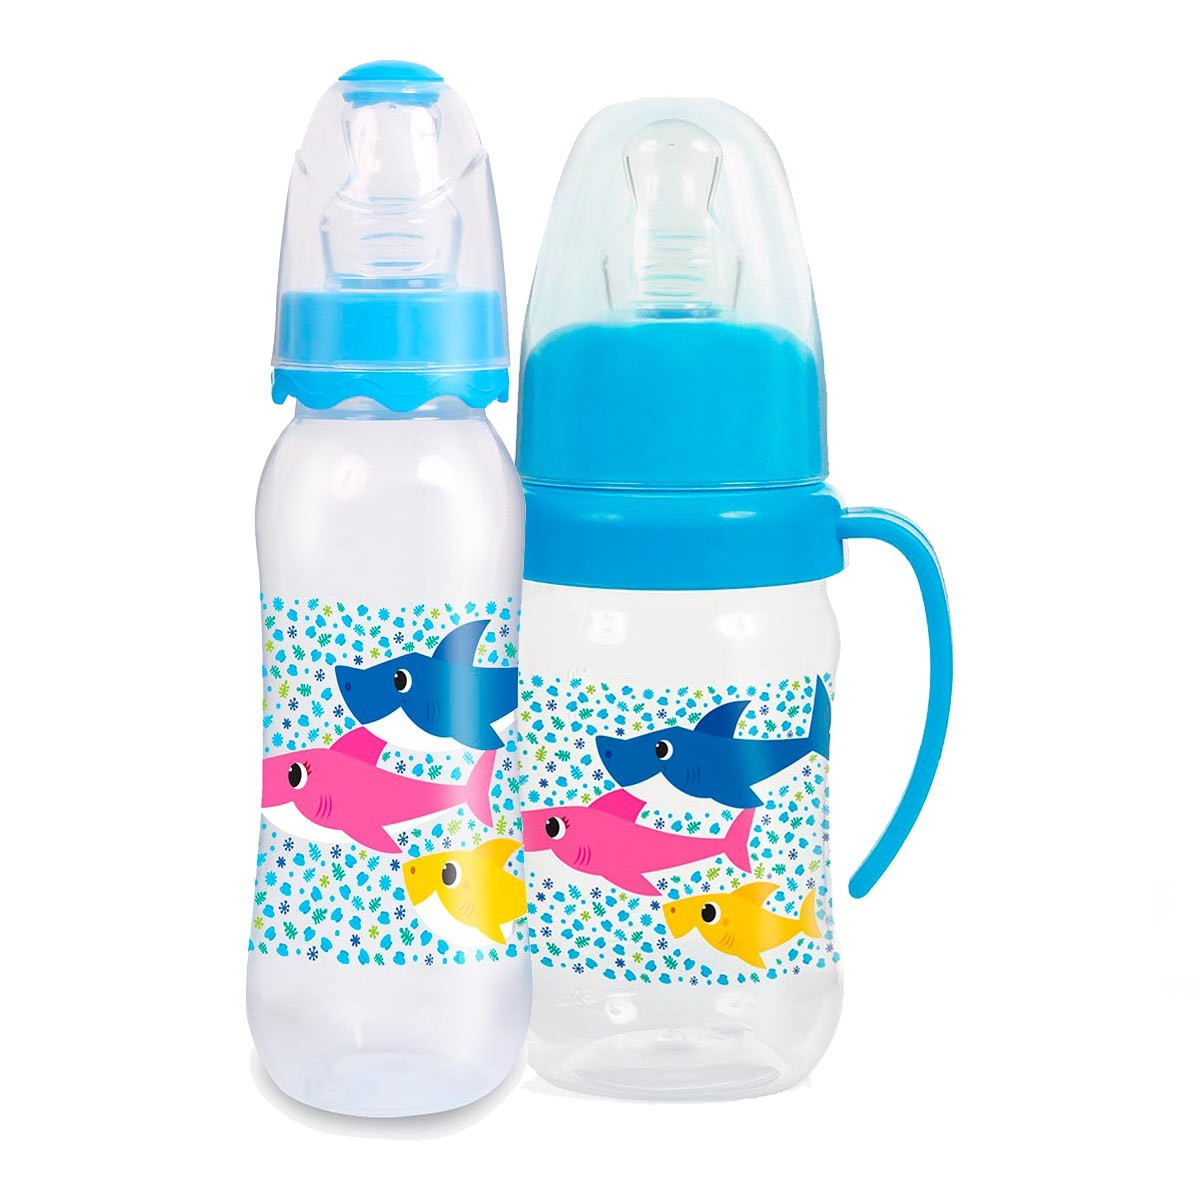 Kit De Mamadeiras Baby Shark Azul BabyGo Premium